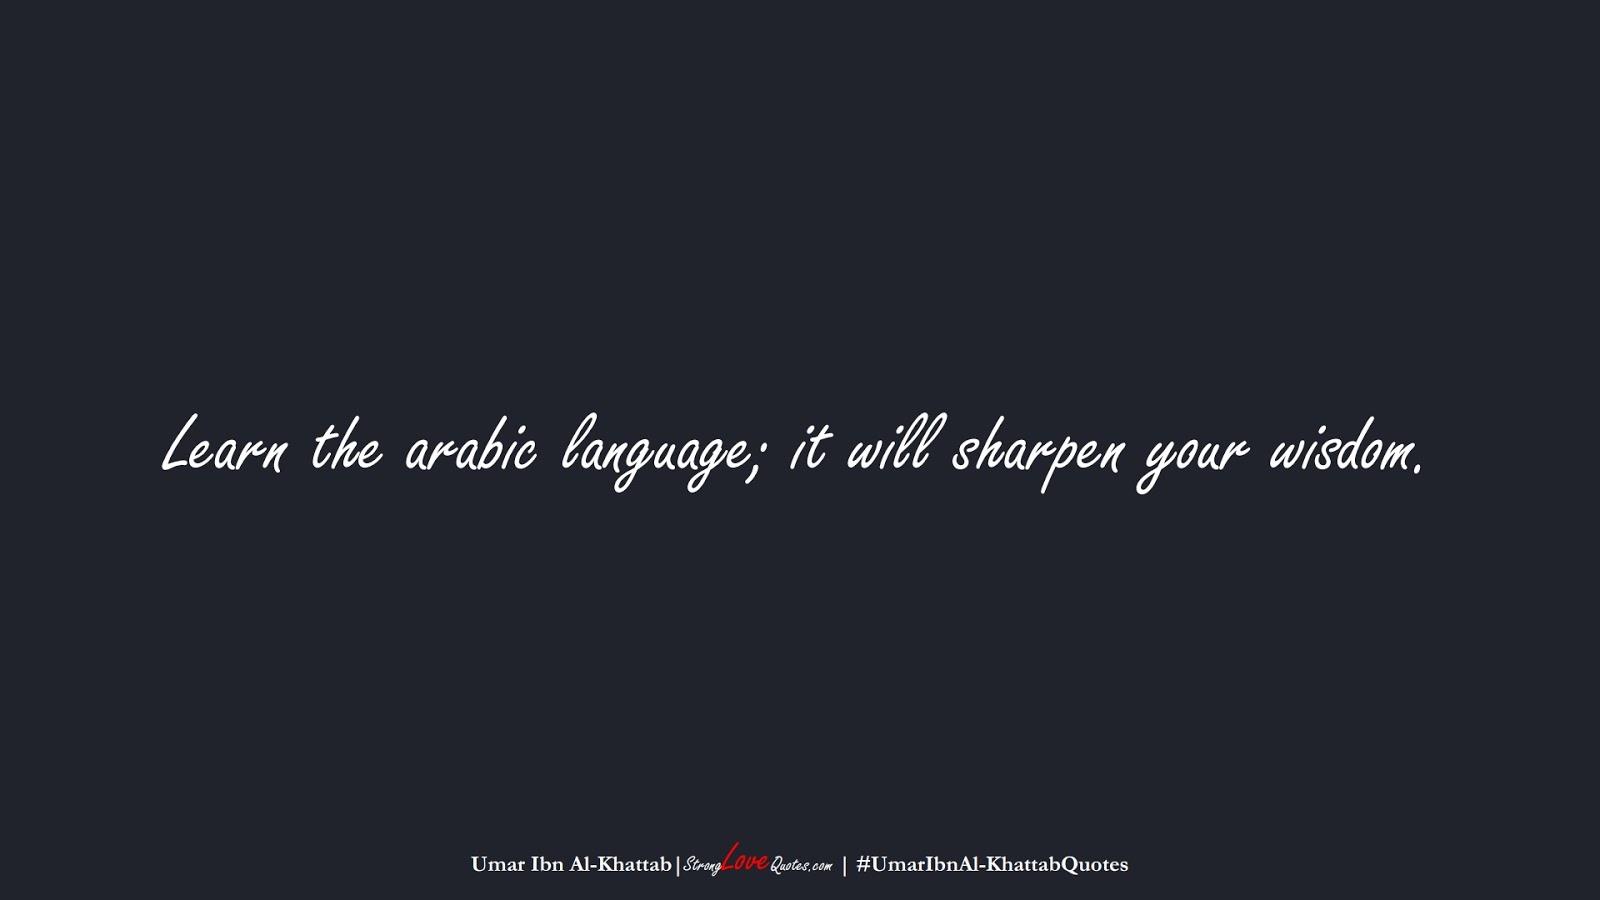 Learn the arabic language; it will sharpen your wisdom. (Umar Ibn Al-Khattab);  #UmarIbnAl-KhattabQuotes